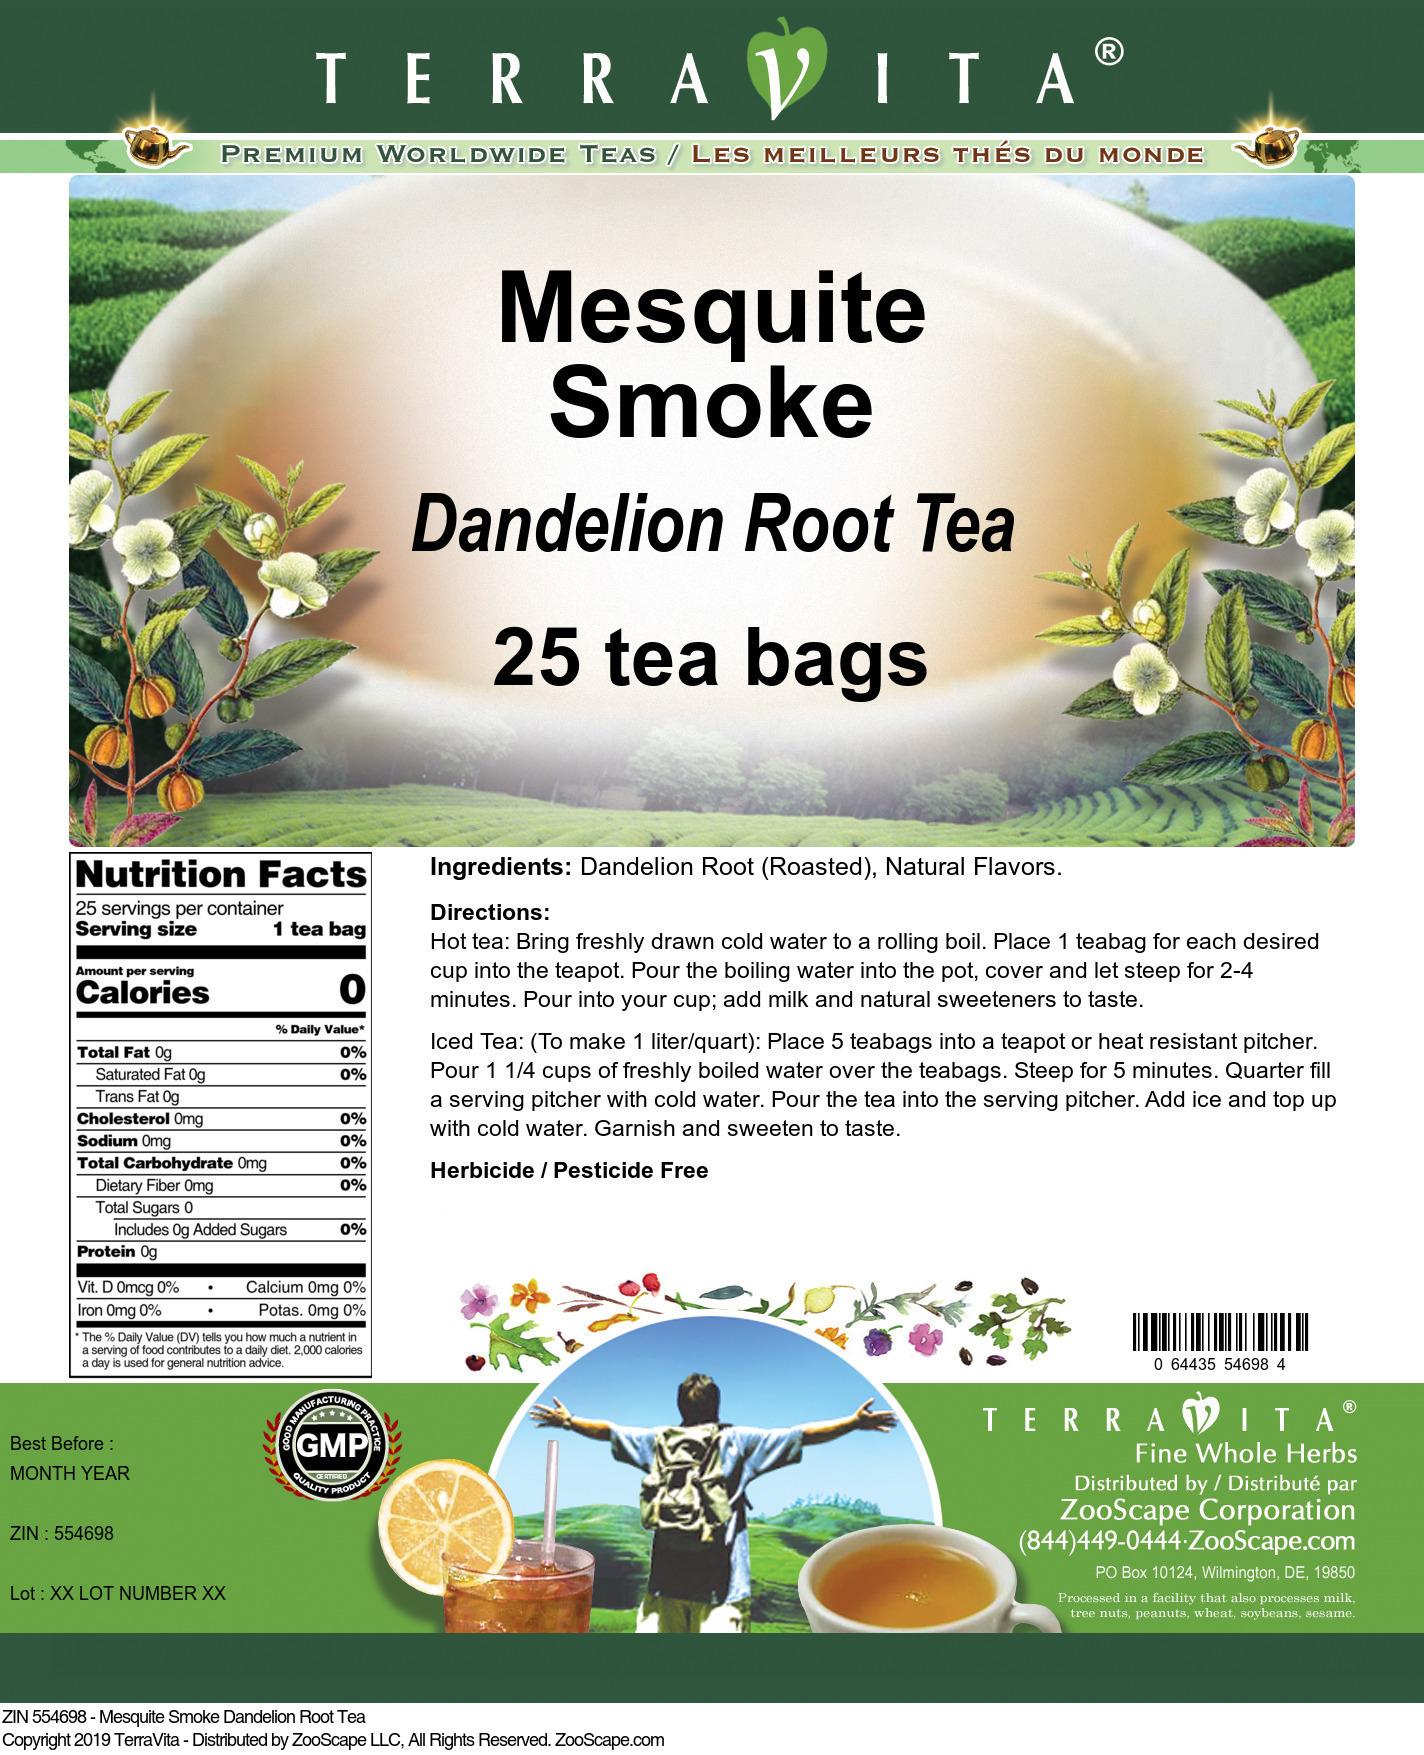 Mesquite Smoke Dandelion Root